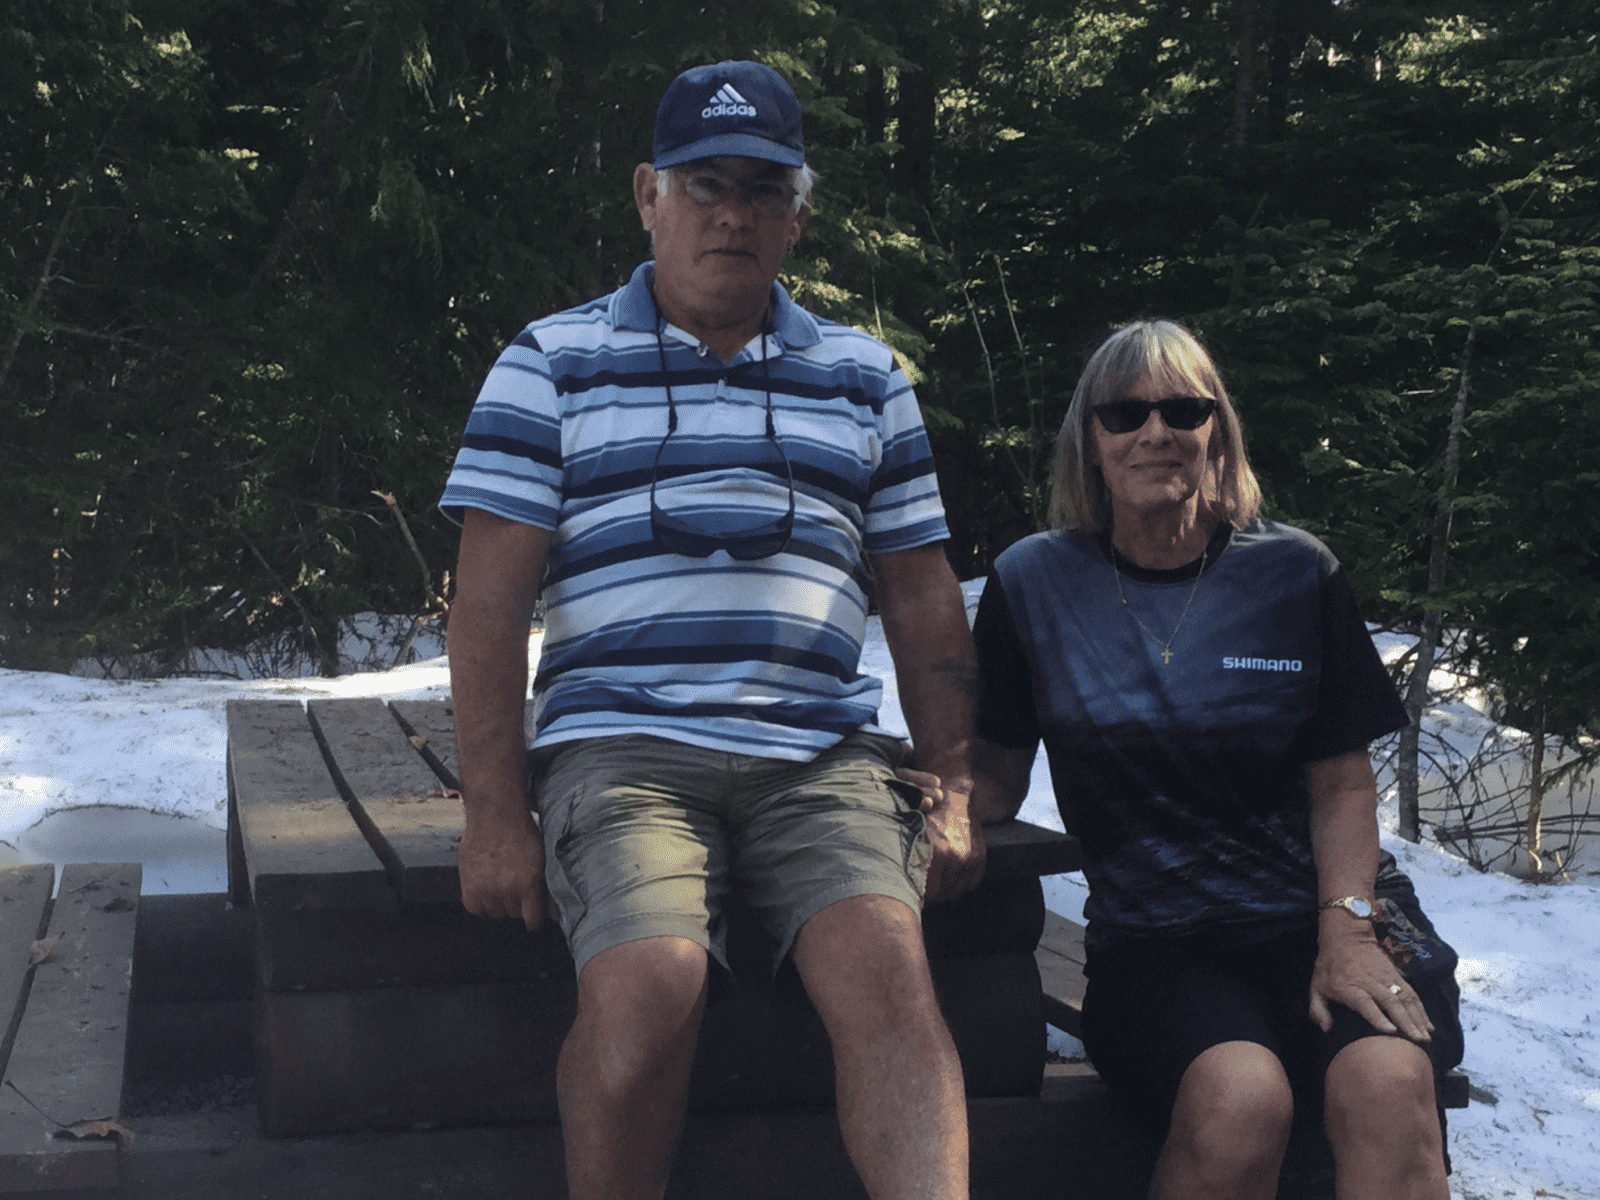 Shaun & Susan from Melbourne, Victoria, Australia